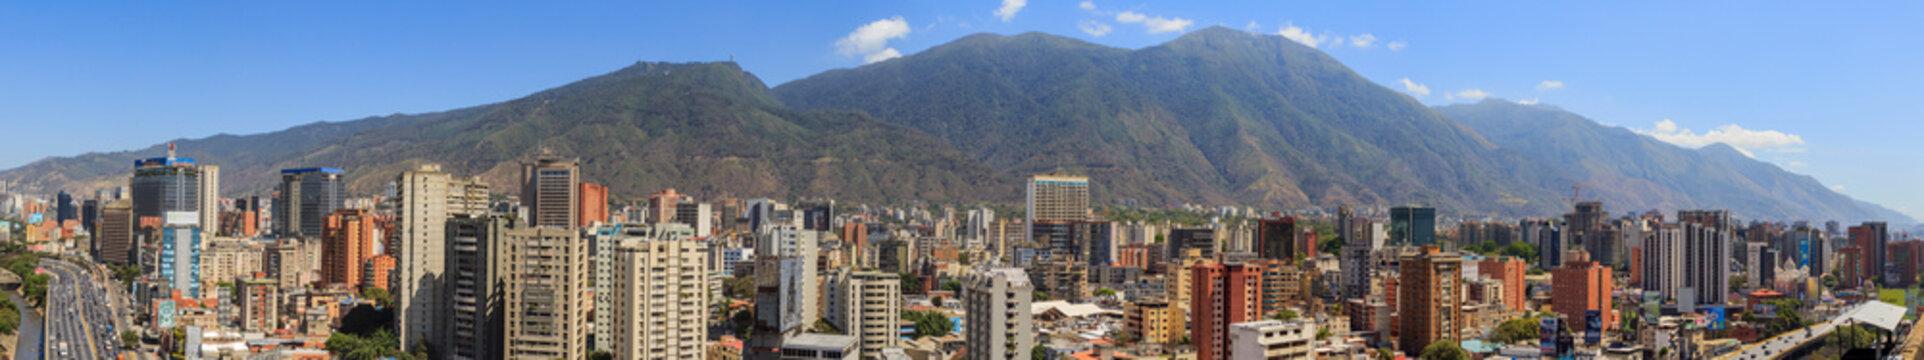 Avila and Caracas Panoramic from Venezuela